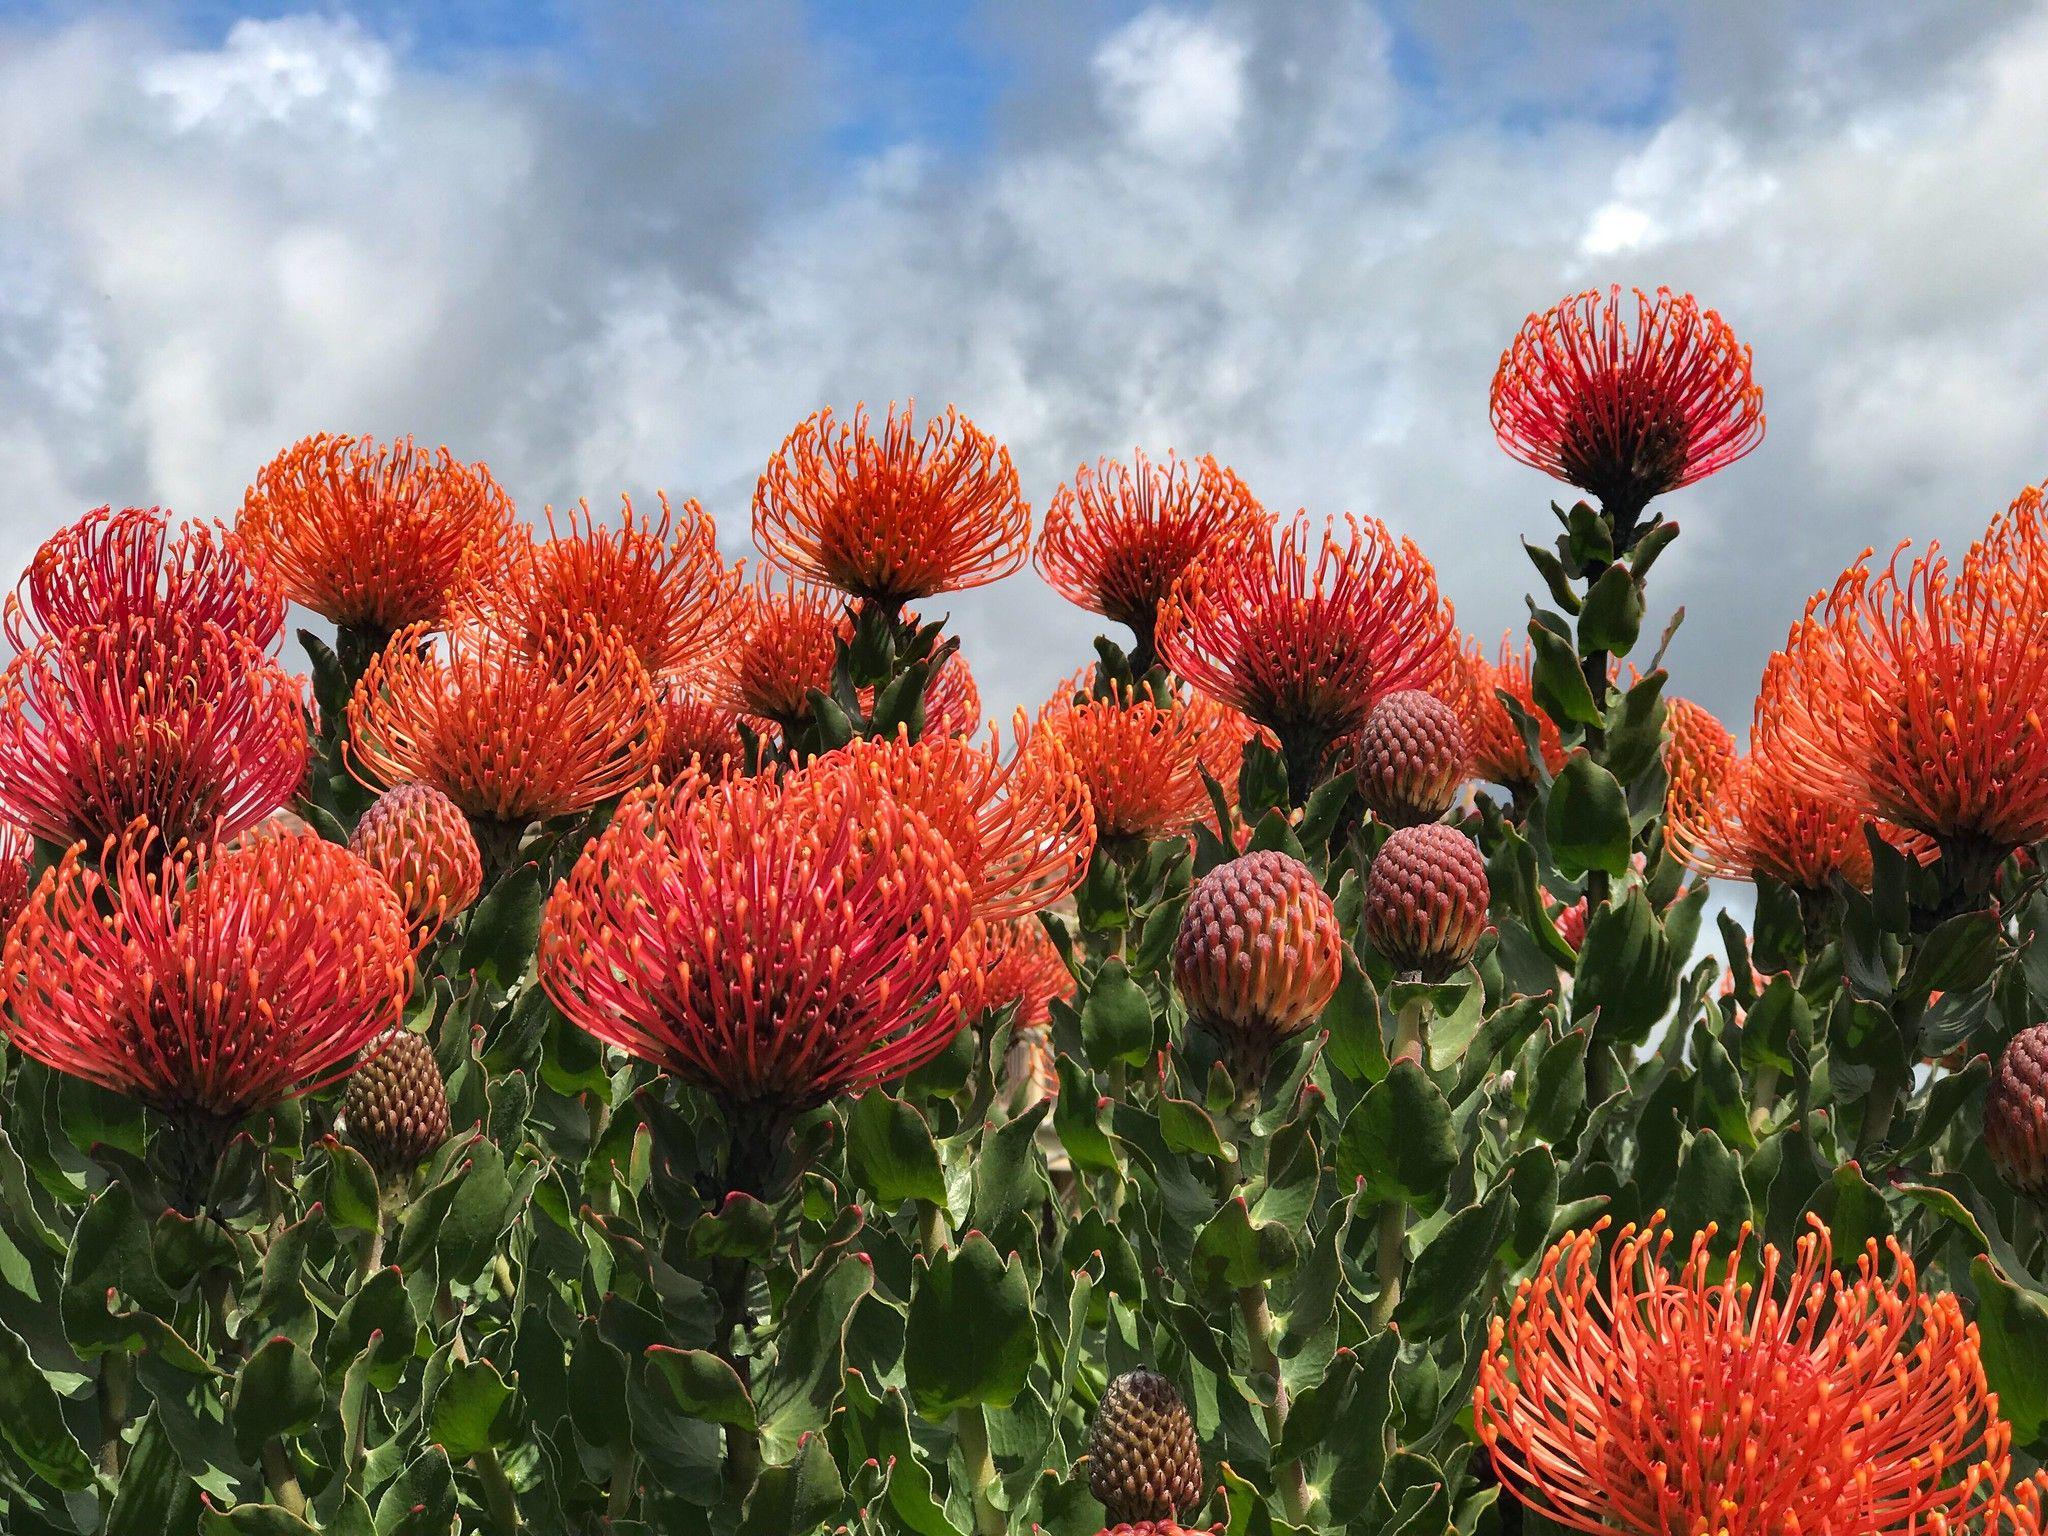 Protea The Pincushion Plant Protea Plant Plants Orange Plant